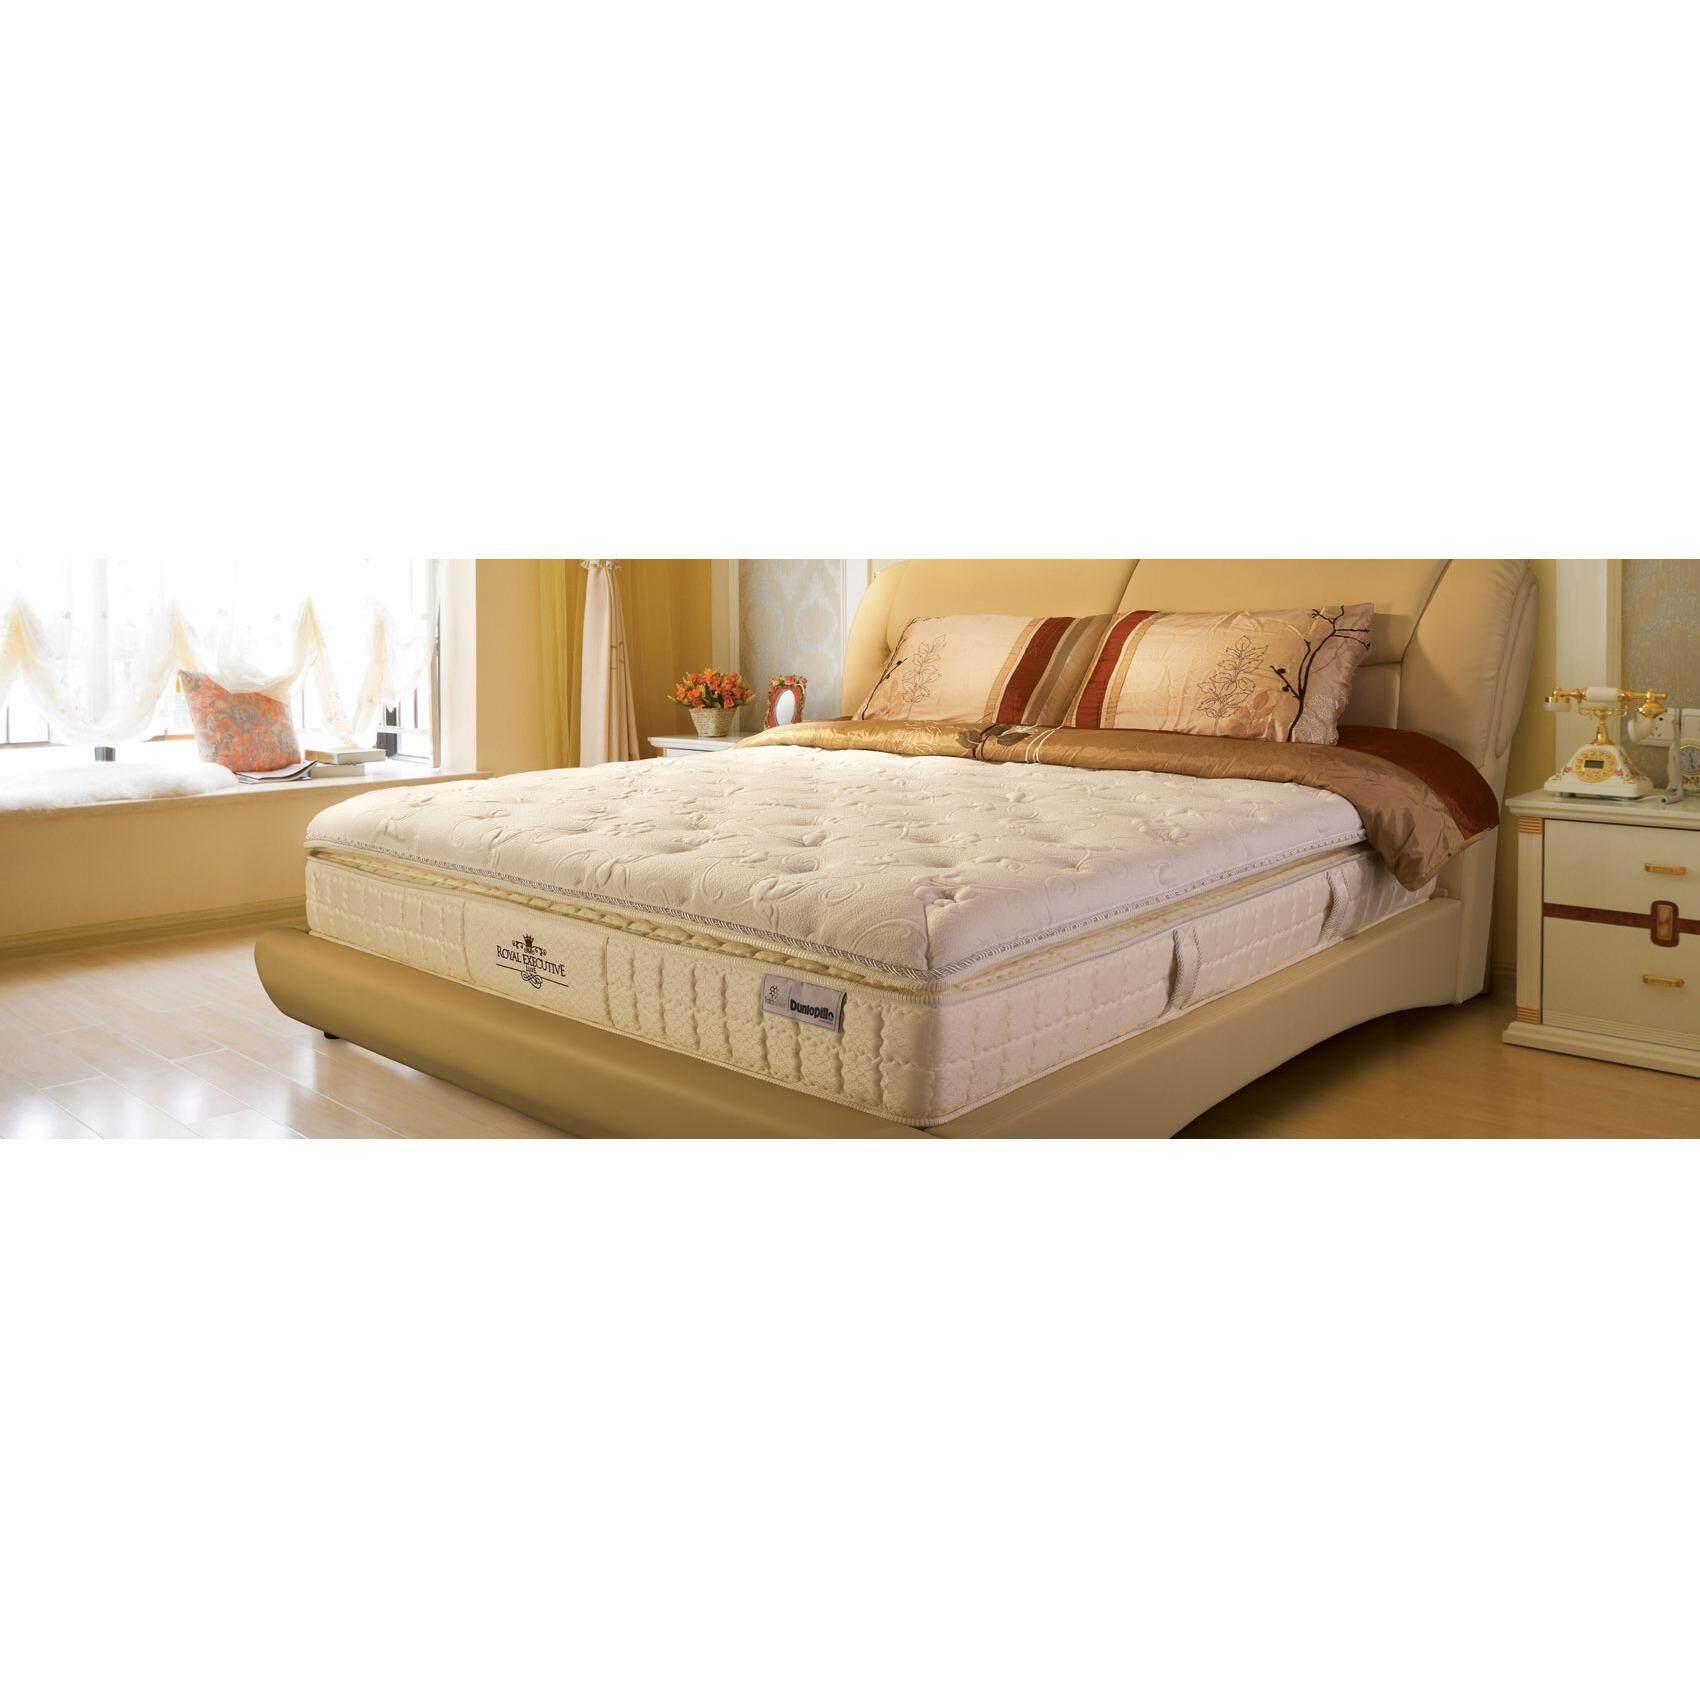 dunlopillo home mattresses price in malaysia best dunlopillo home